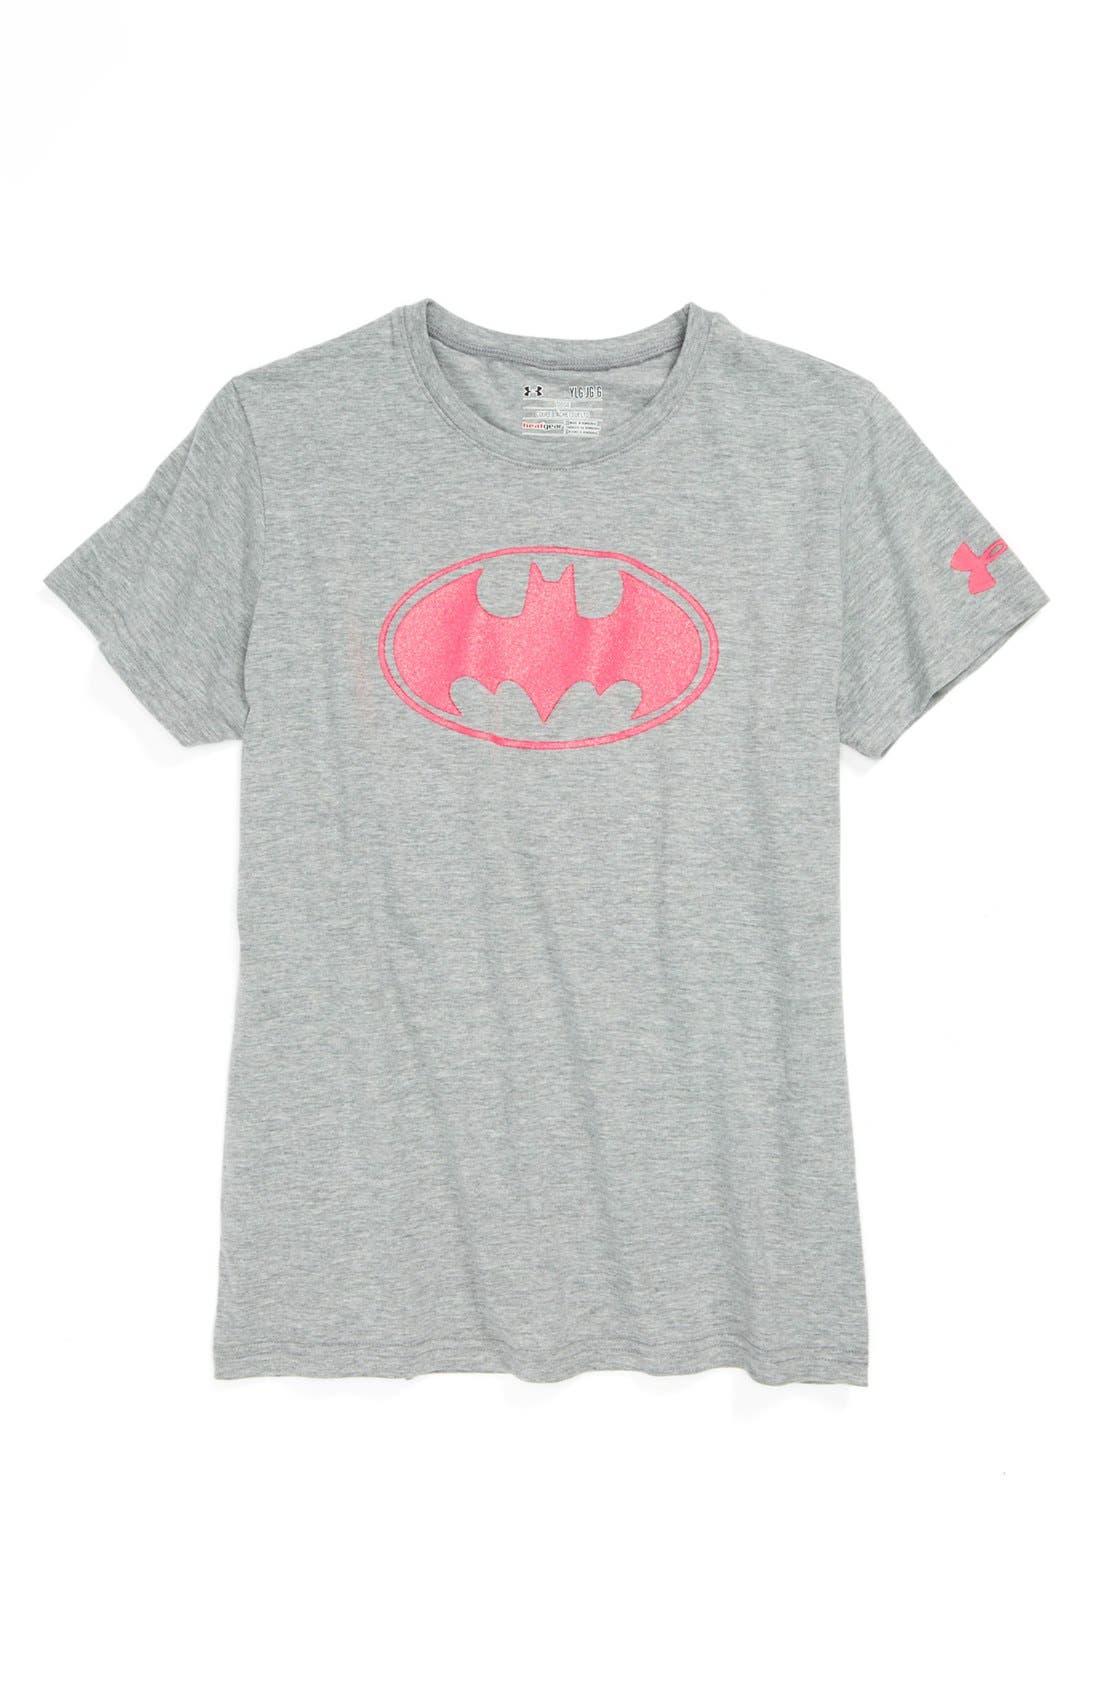 Main Image - Under Armour 'Batman' Charged Cotton® Tee (Little Girls & Big Girls)